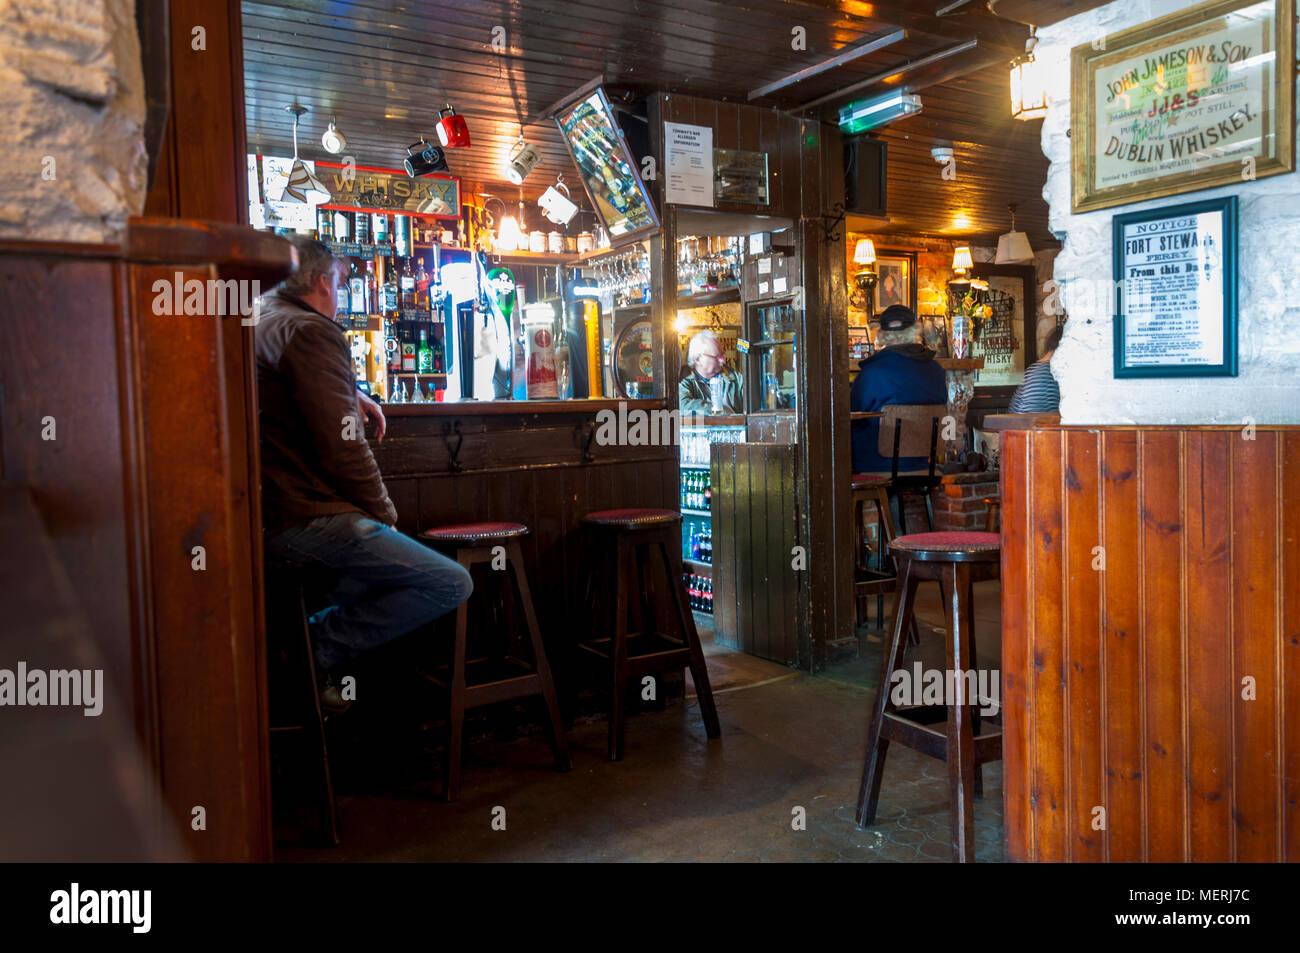 Ireland Bar Interior Stockfotos & Ireland Bar Interior Bilder - Alamy